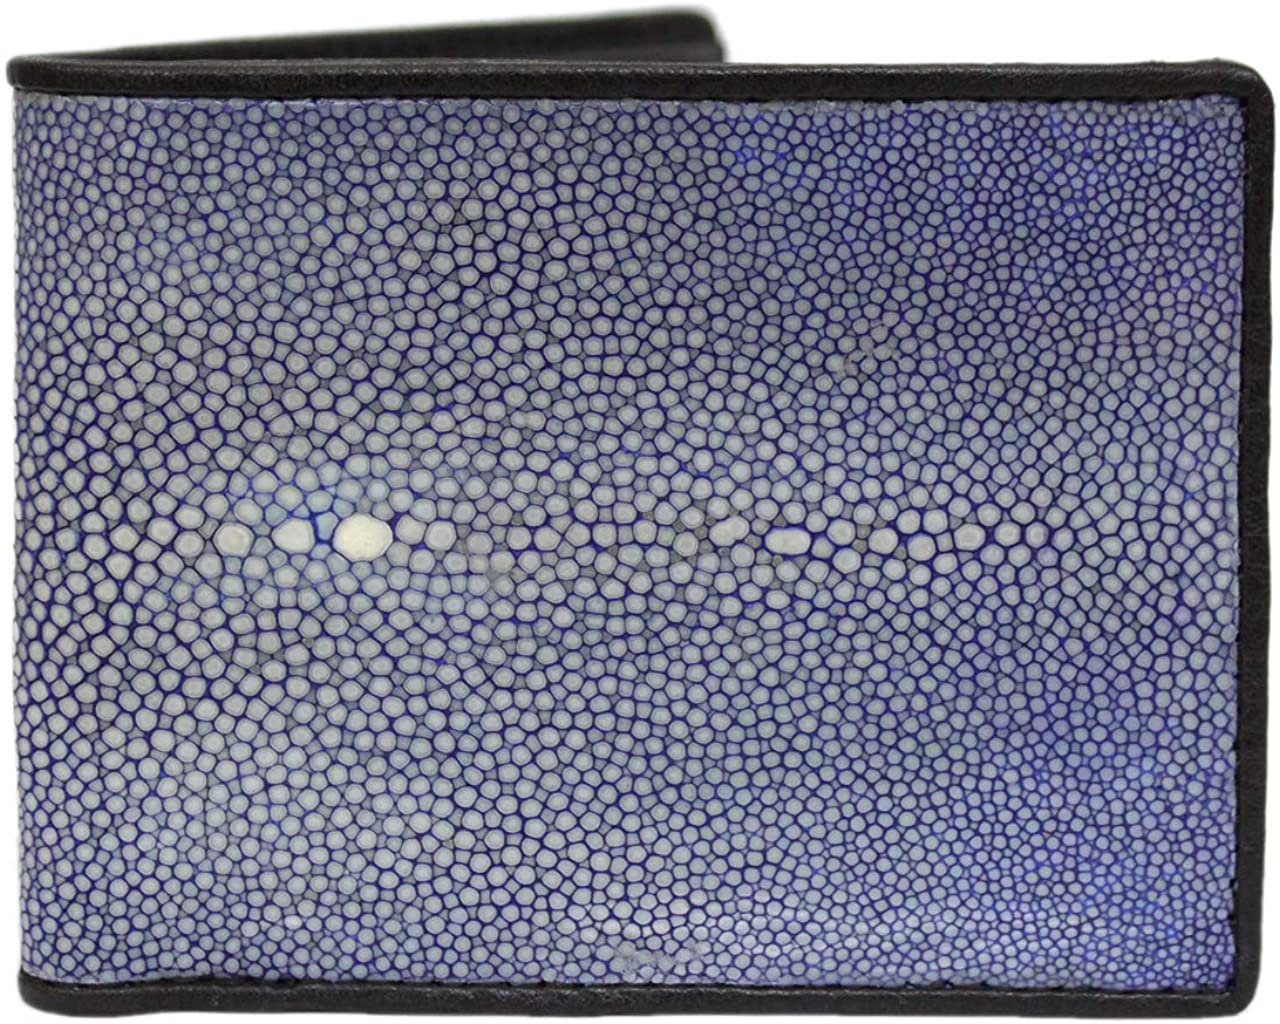 Polished Genuine Stingray Skin Leather Man Bifold Wallet Black